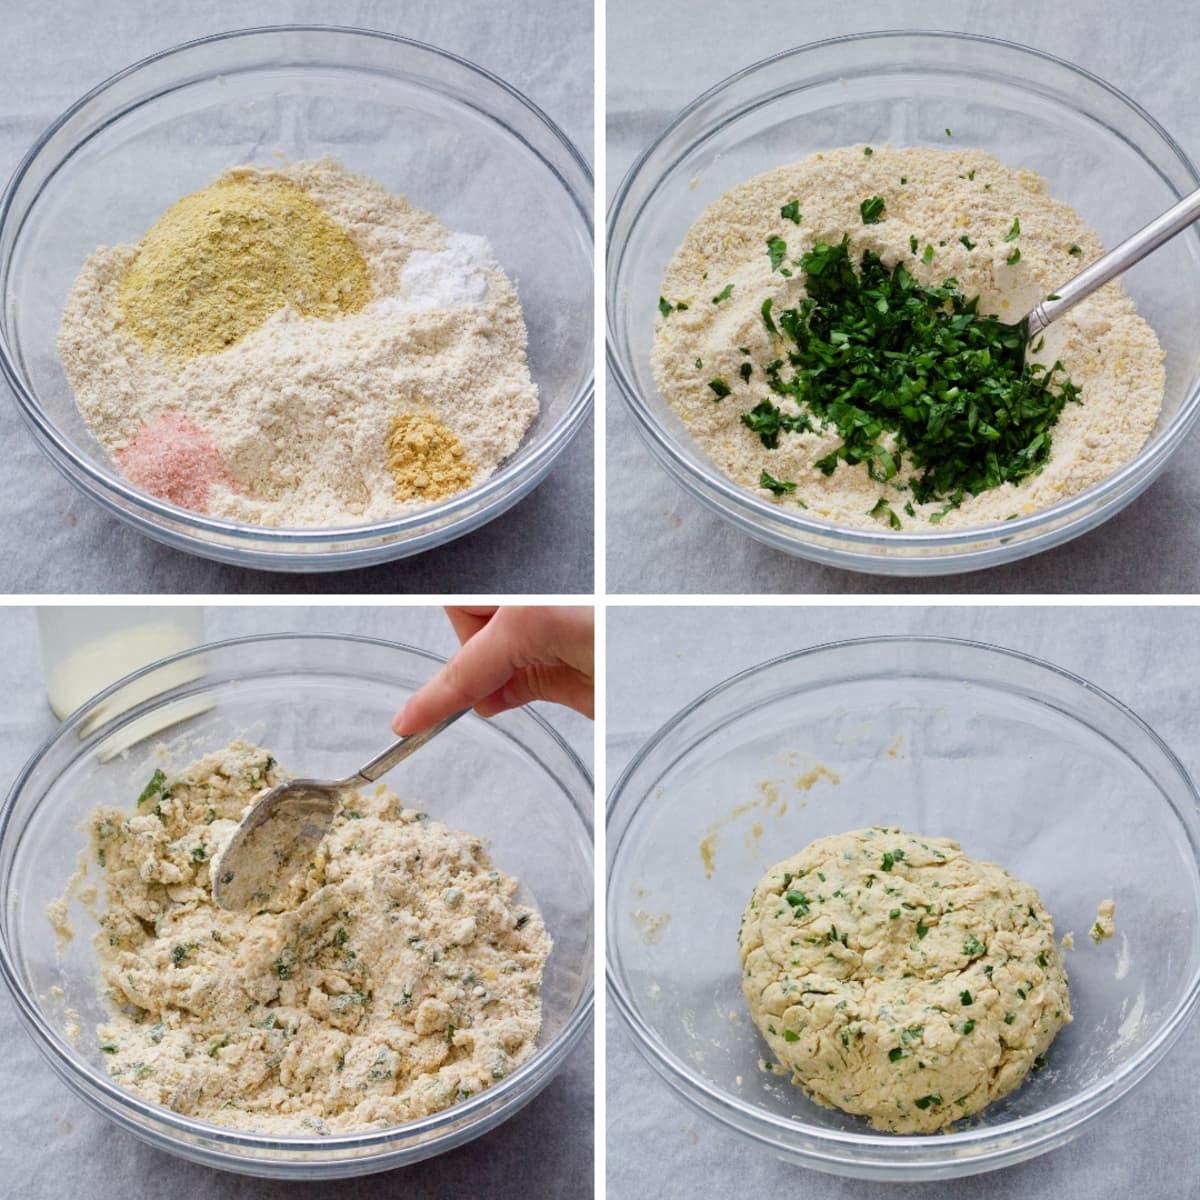 Scone dough making process.